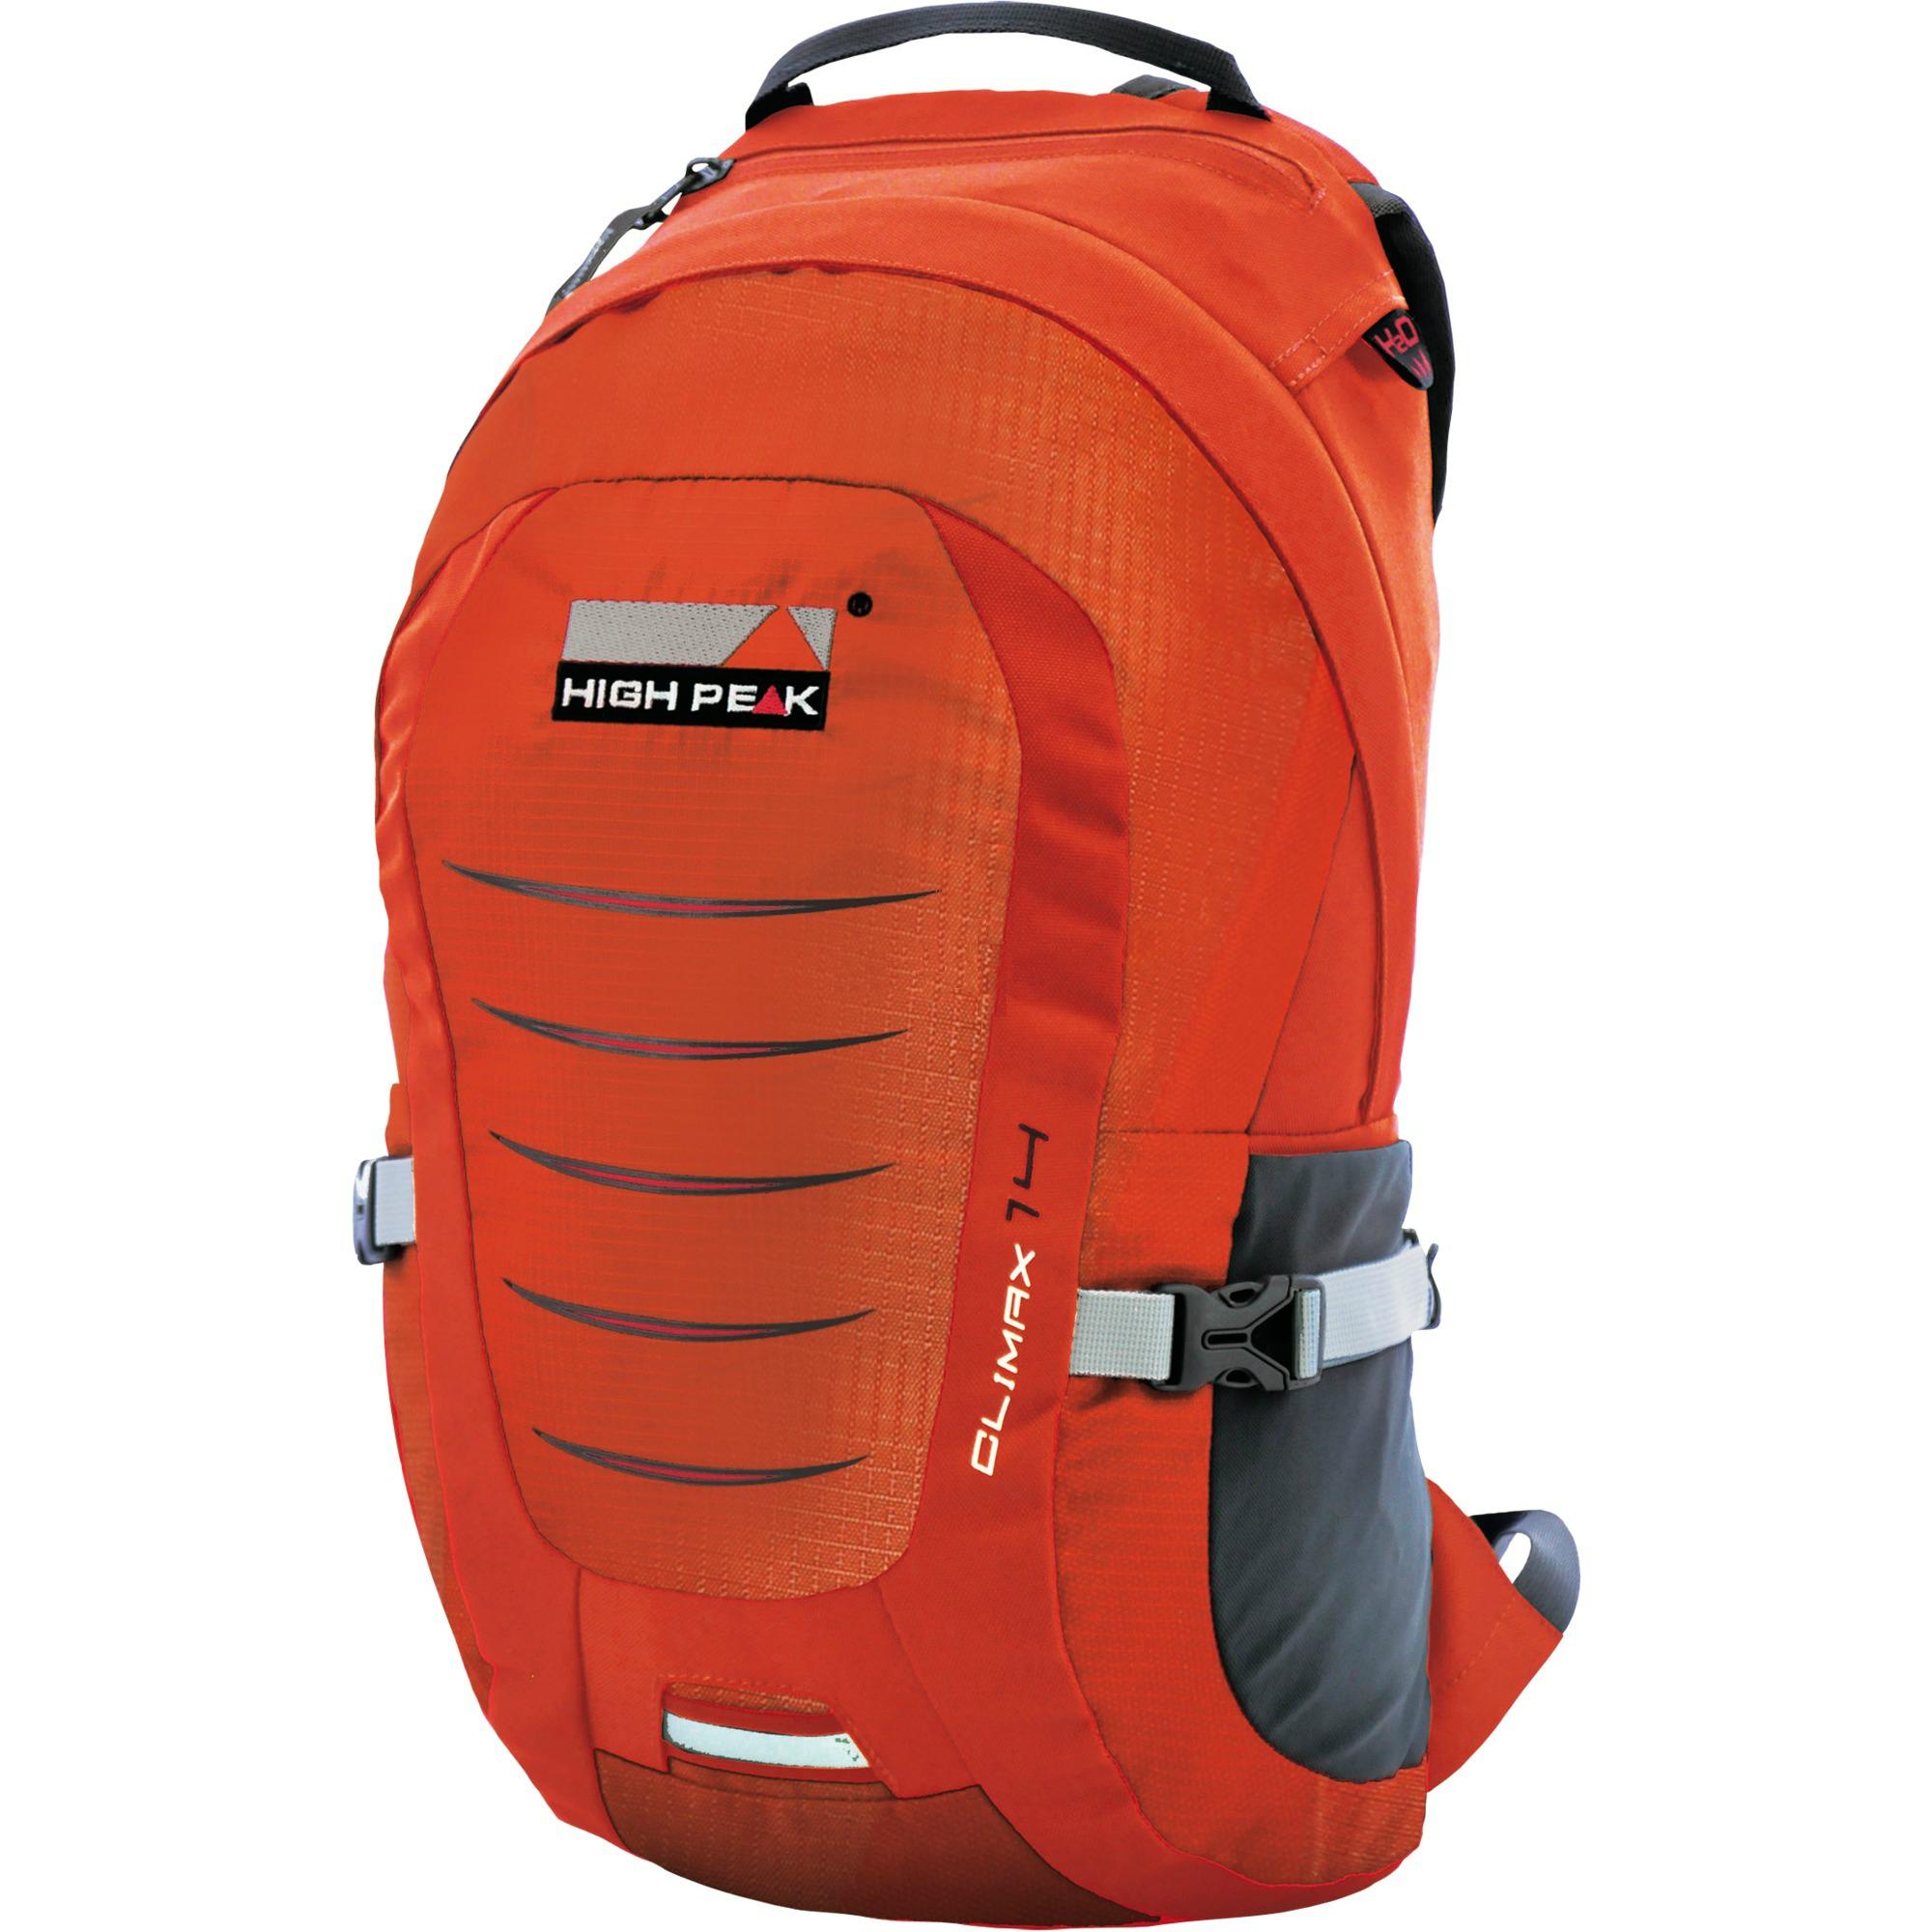 Туристический рюкзак High Peak Climax 18 л оранжевый фото